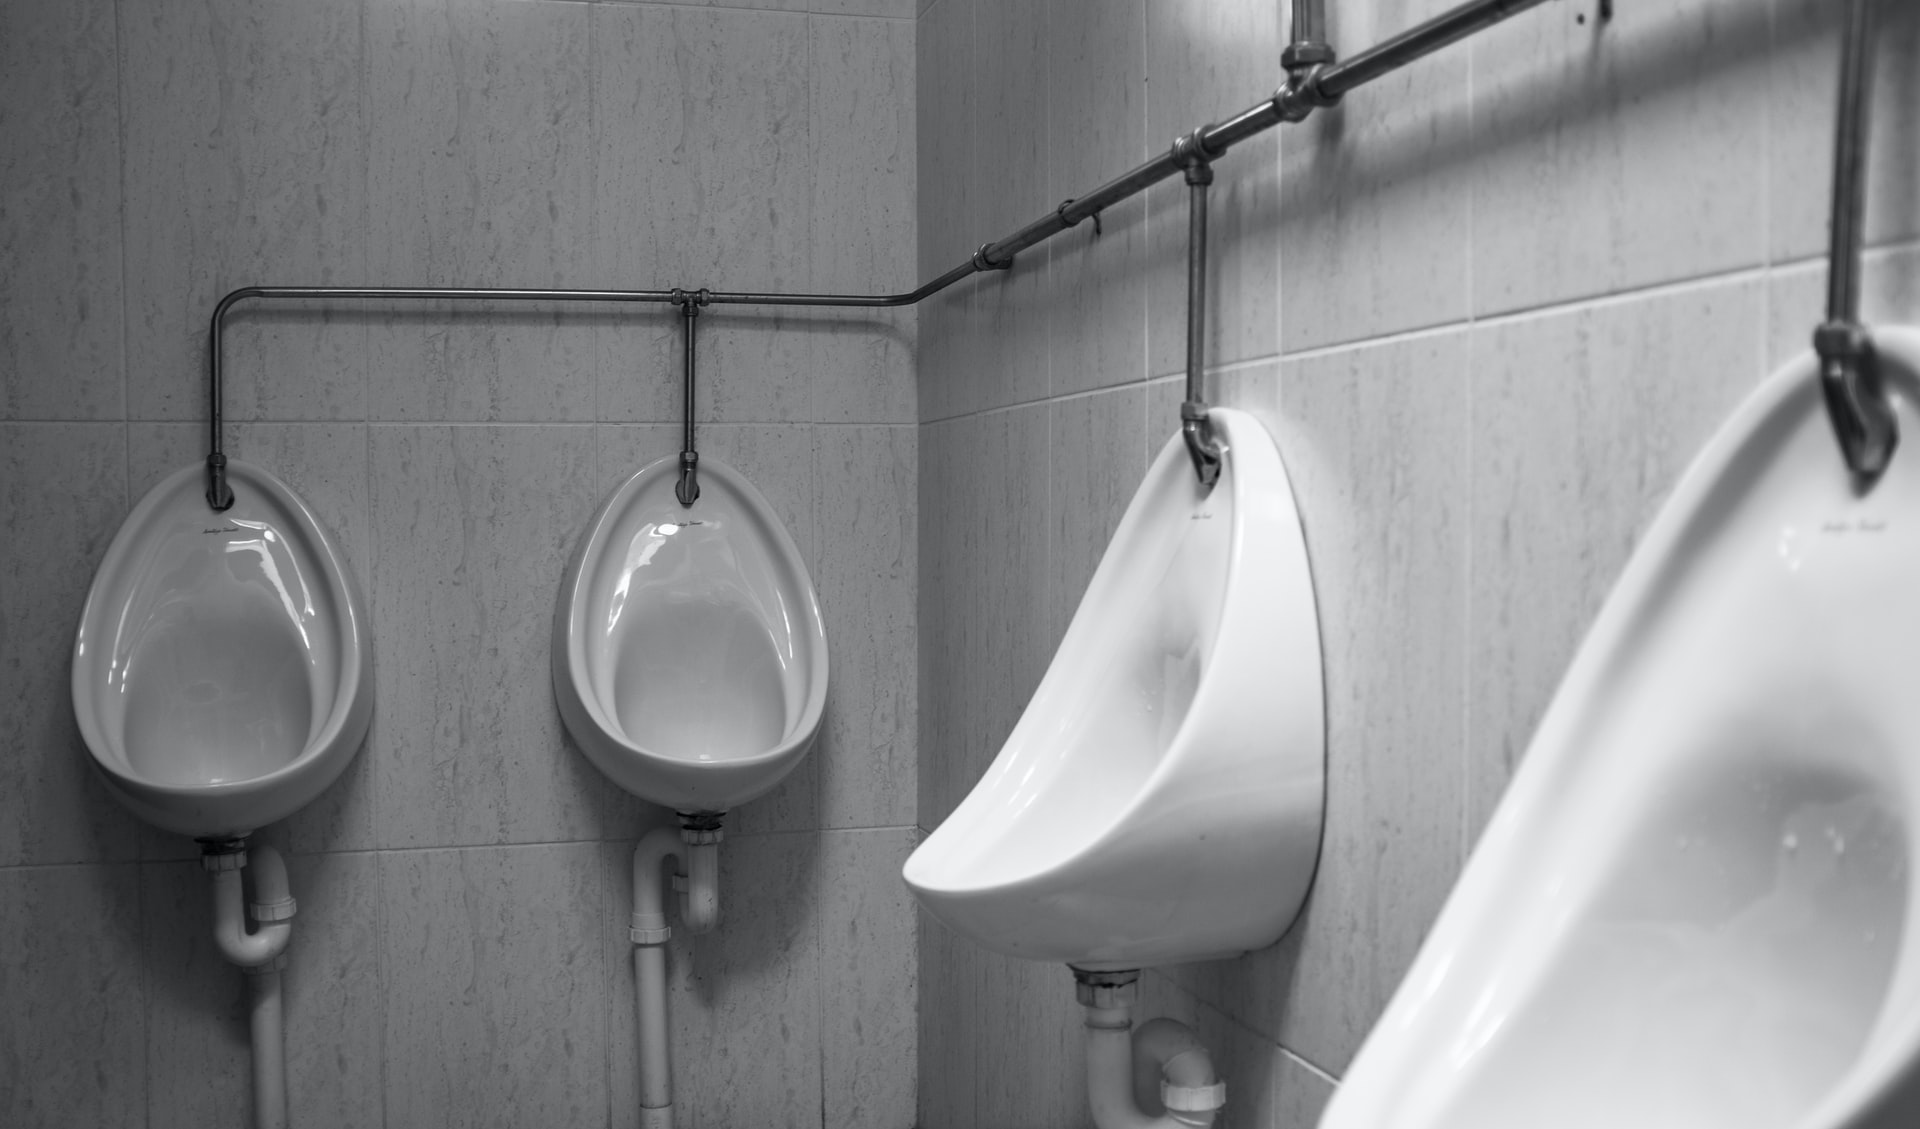 urinal water sure is deep